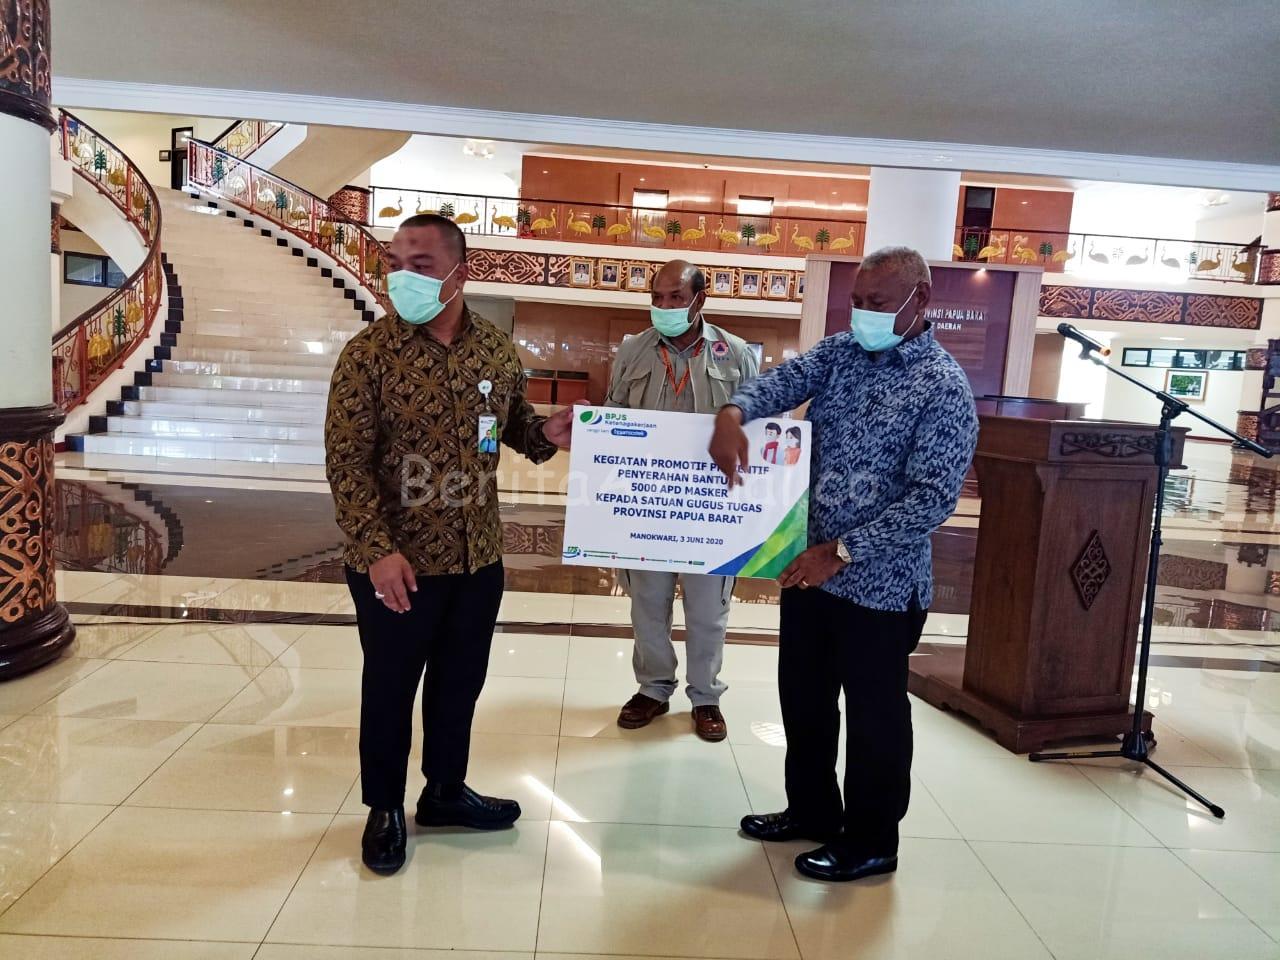 Gubernur Papua Barat Terima Bantuan 5000 Masker Dari BPJS Ketenagakerjaan 4 IMG 20200604 WA0056